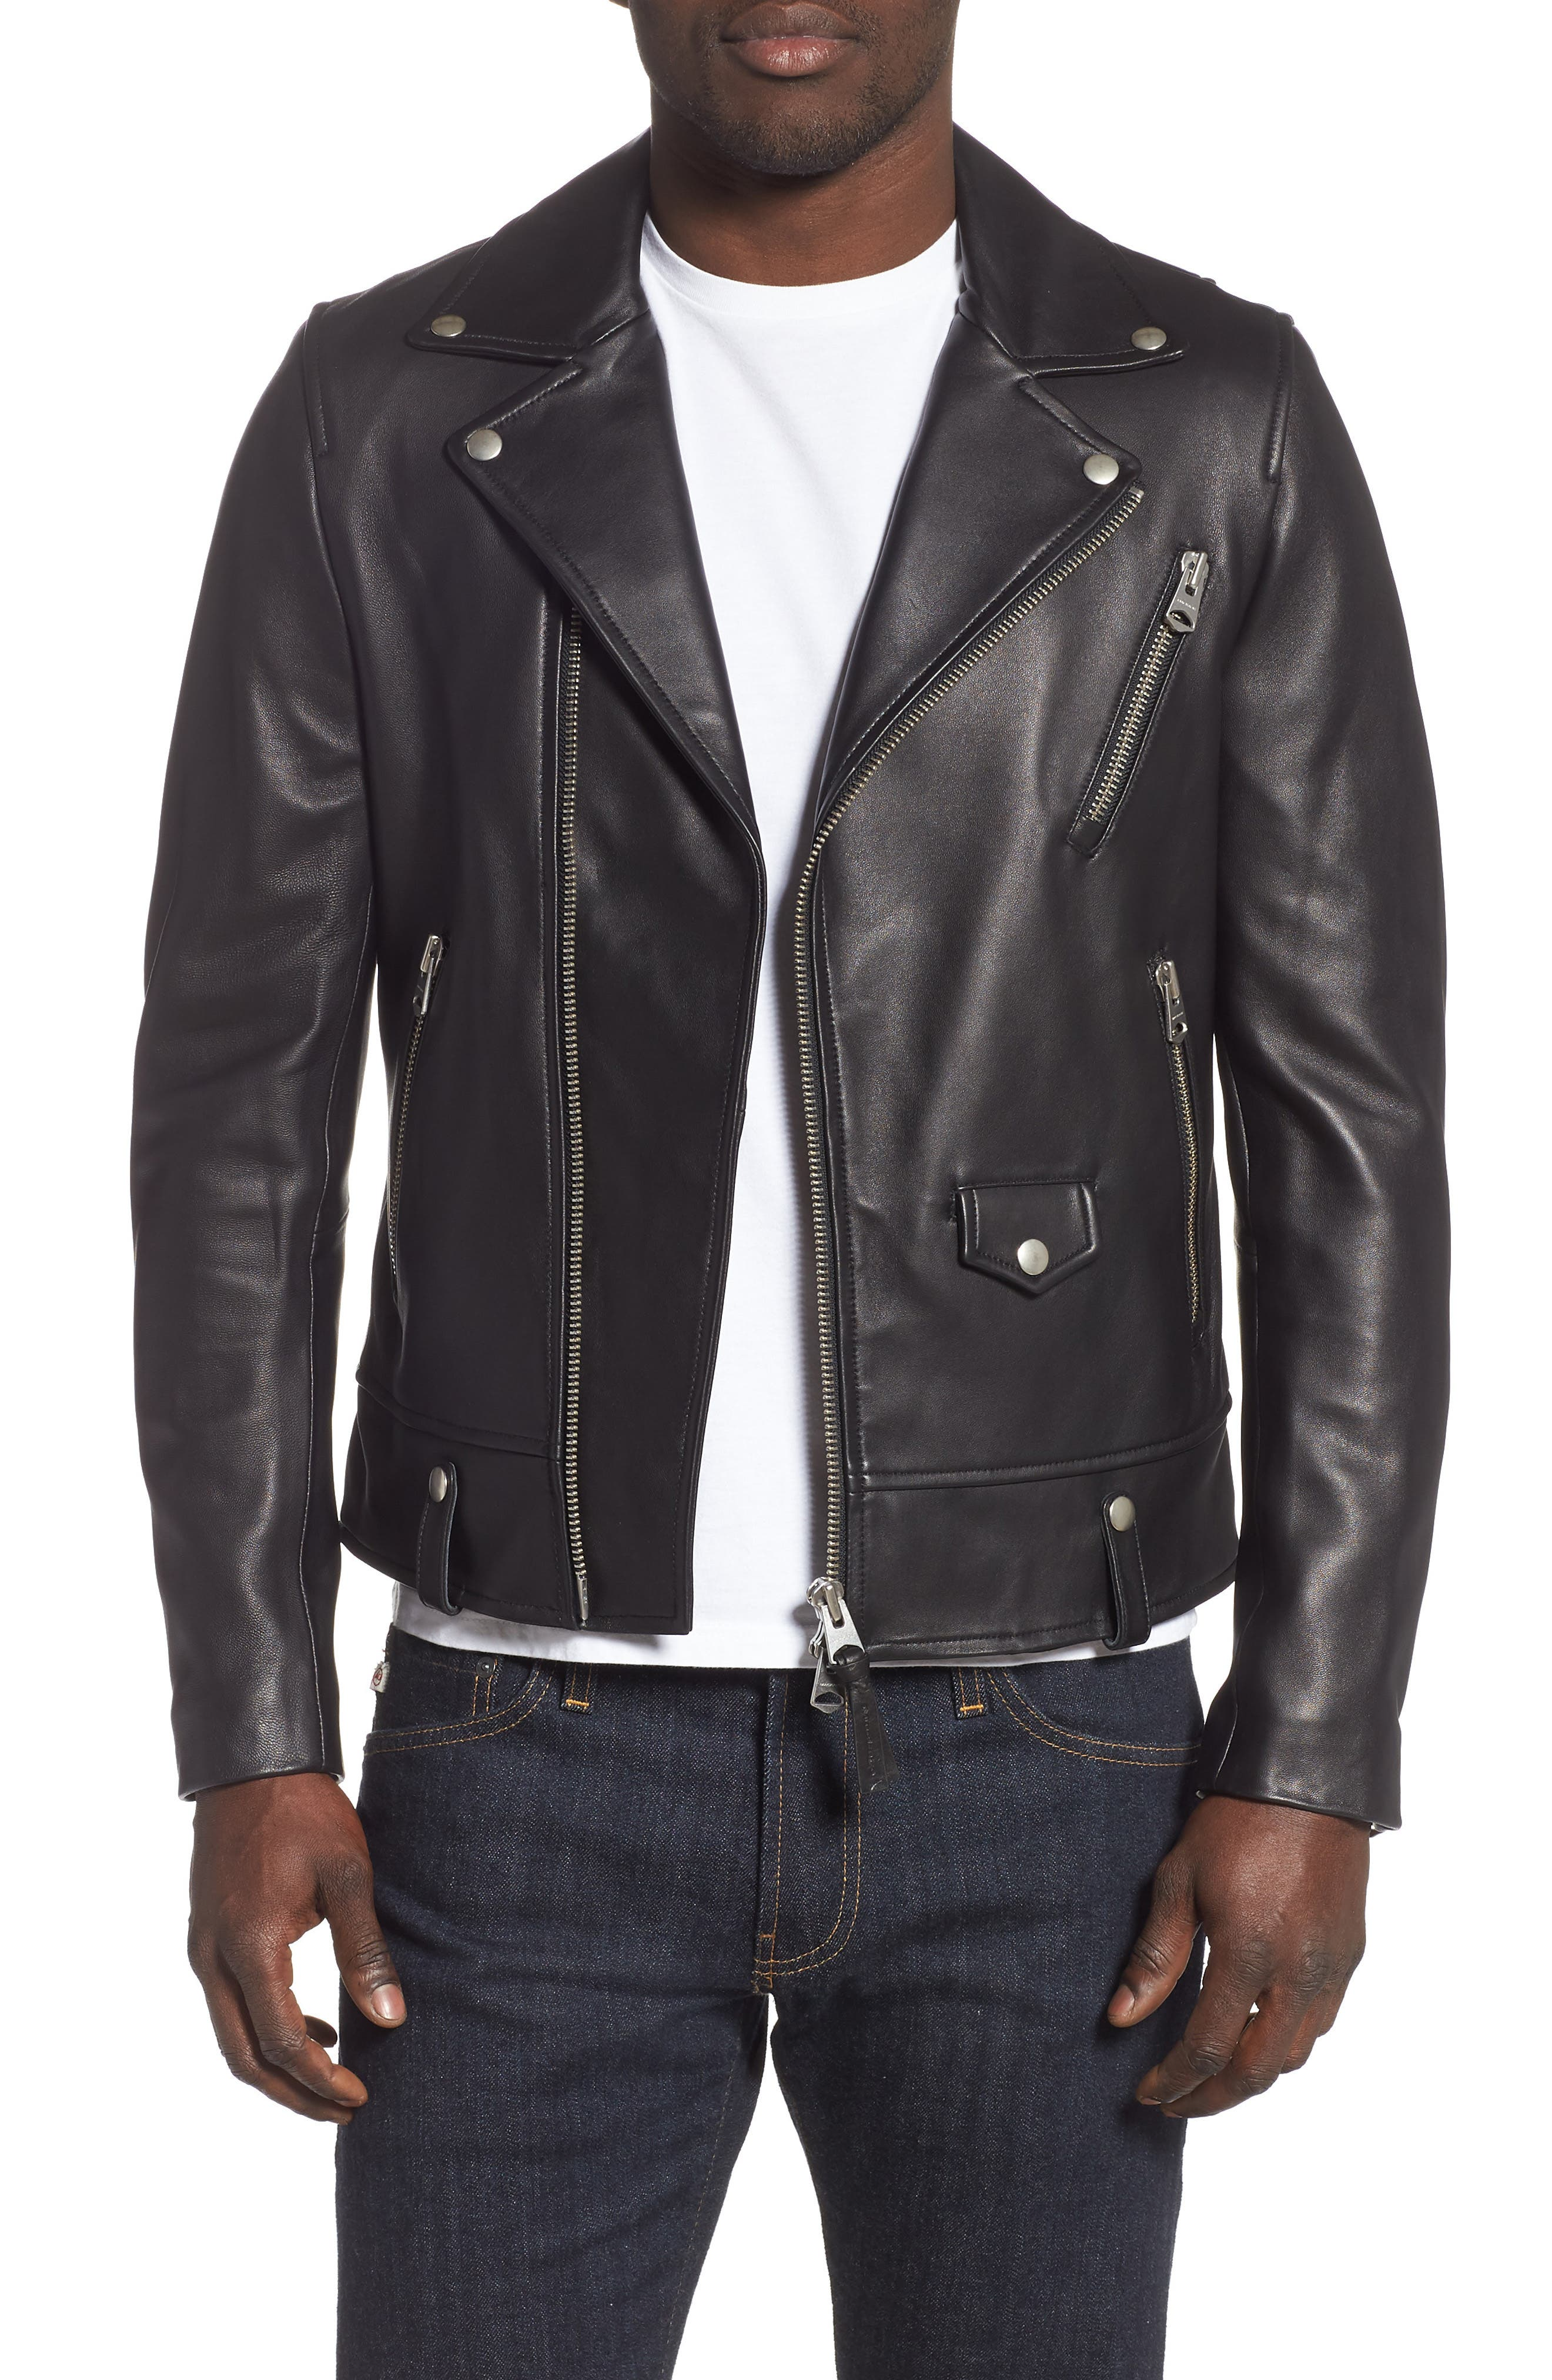 MACKAGE, Fenton Leather Moto Jacket, Main thumbnail 1, color, BLACK